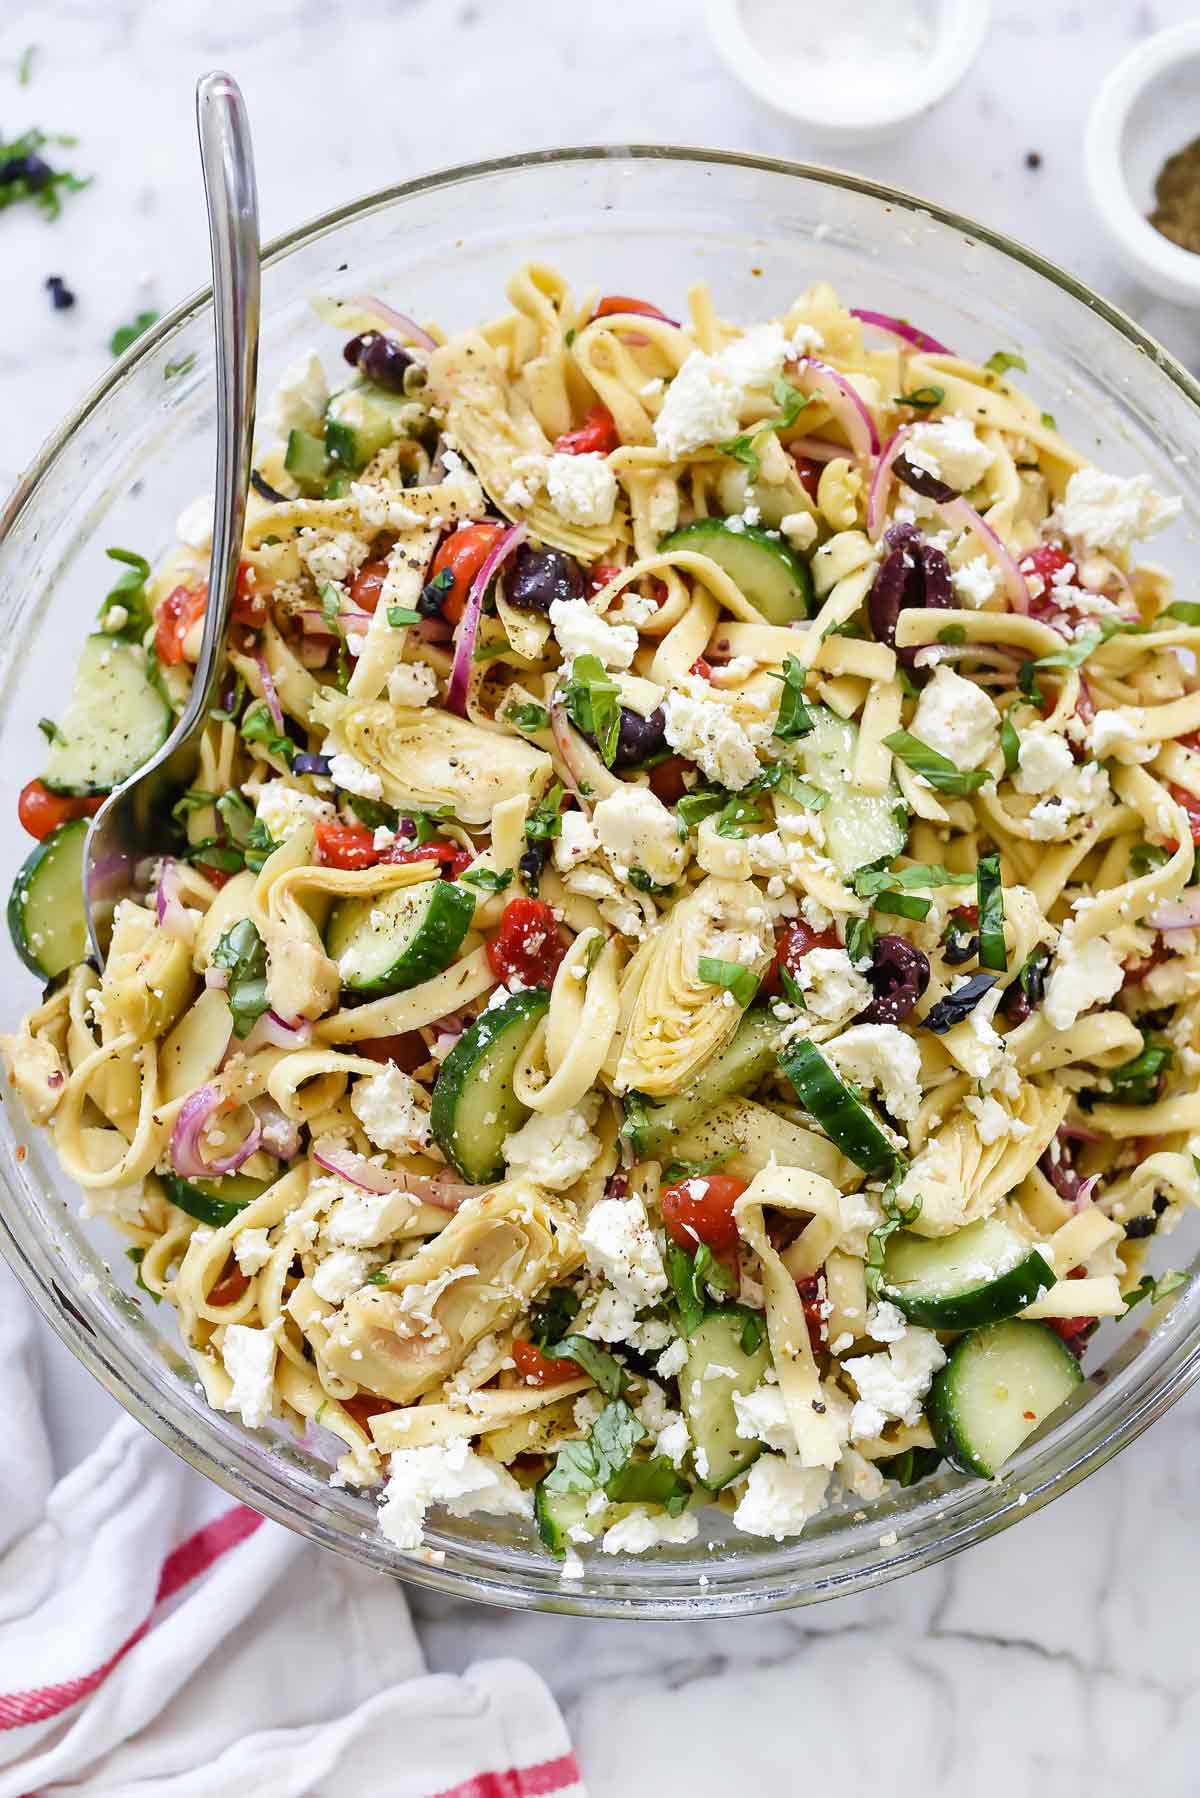 Greek Pasta Salad With Cucumbers Amp Artichoke Hearts Foodiecrush Com